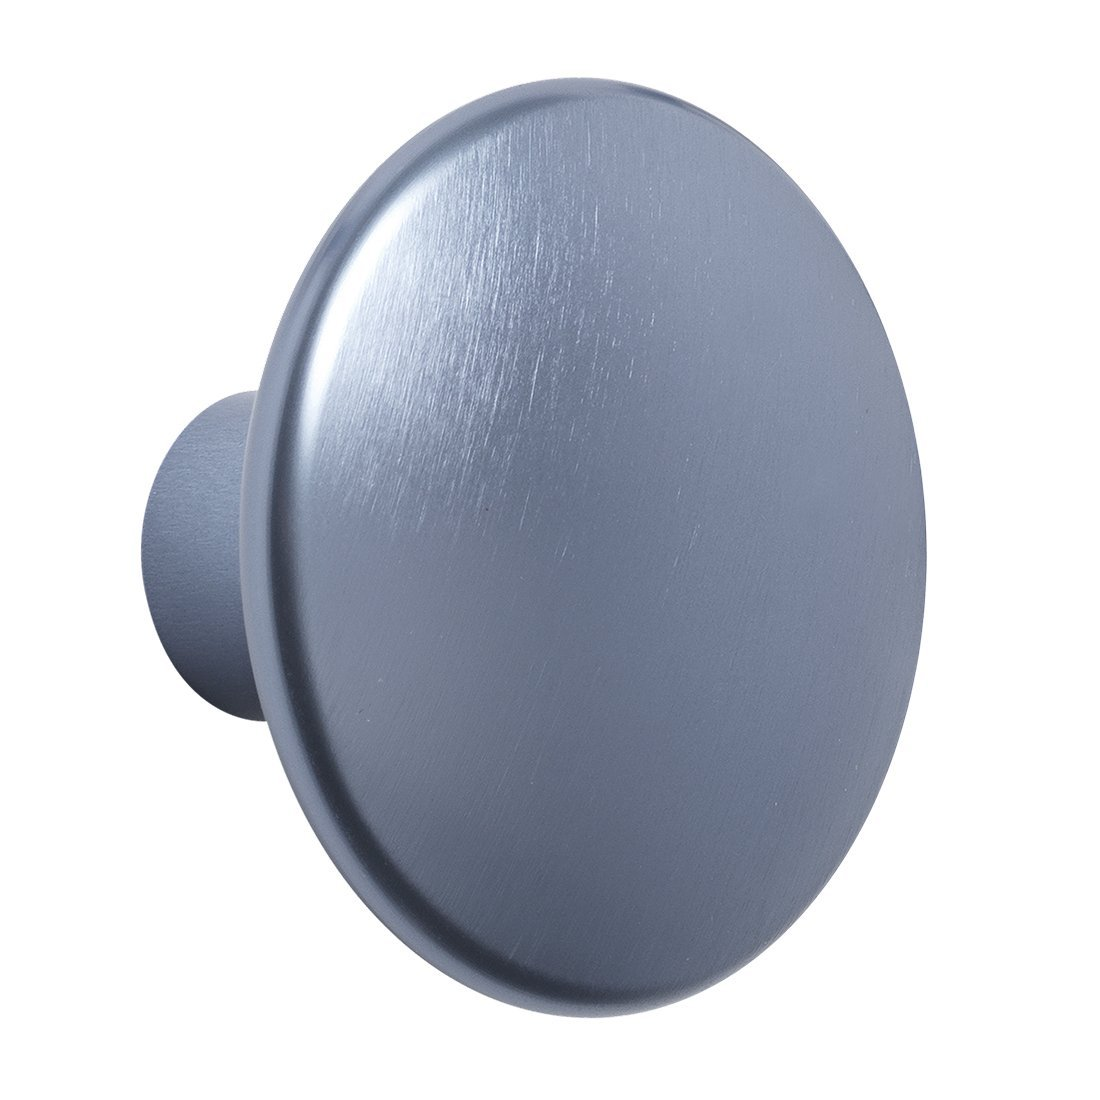 Muuto The Dots Metal Kledinghaak L Pale Blue